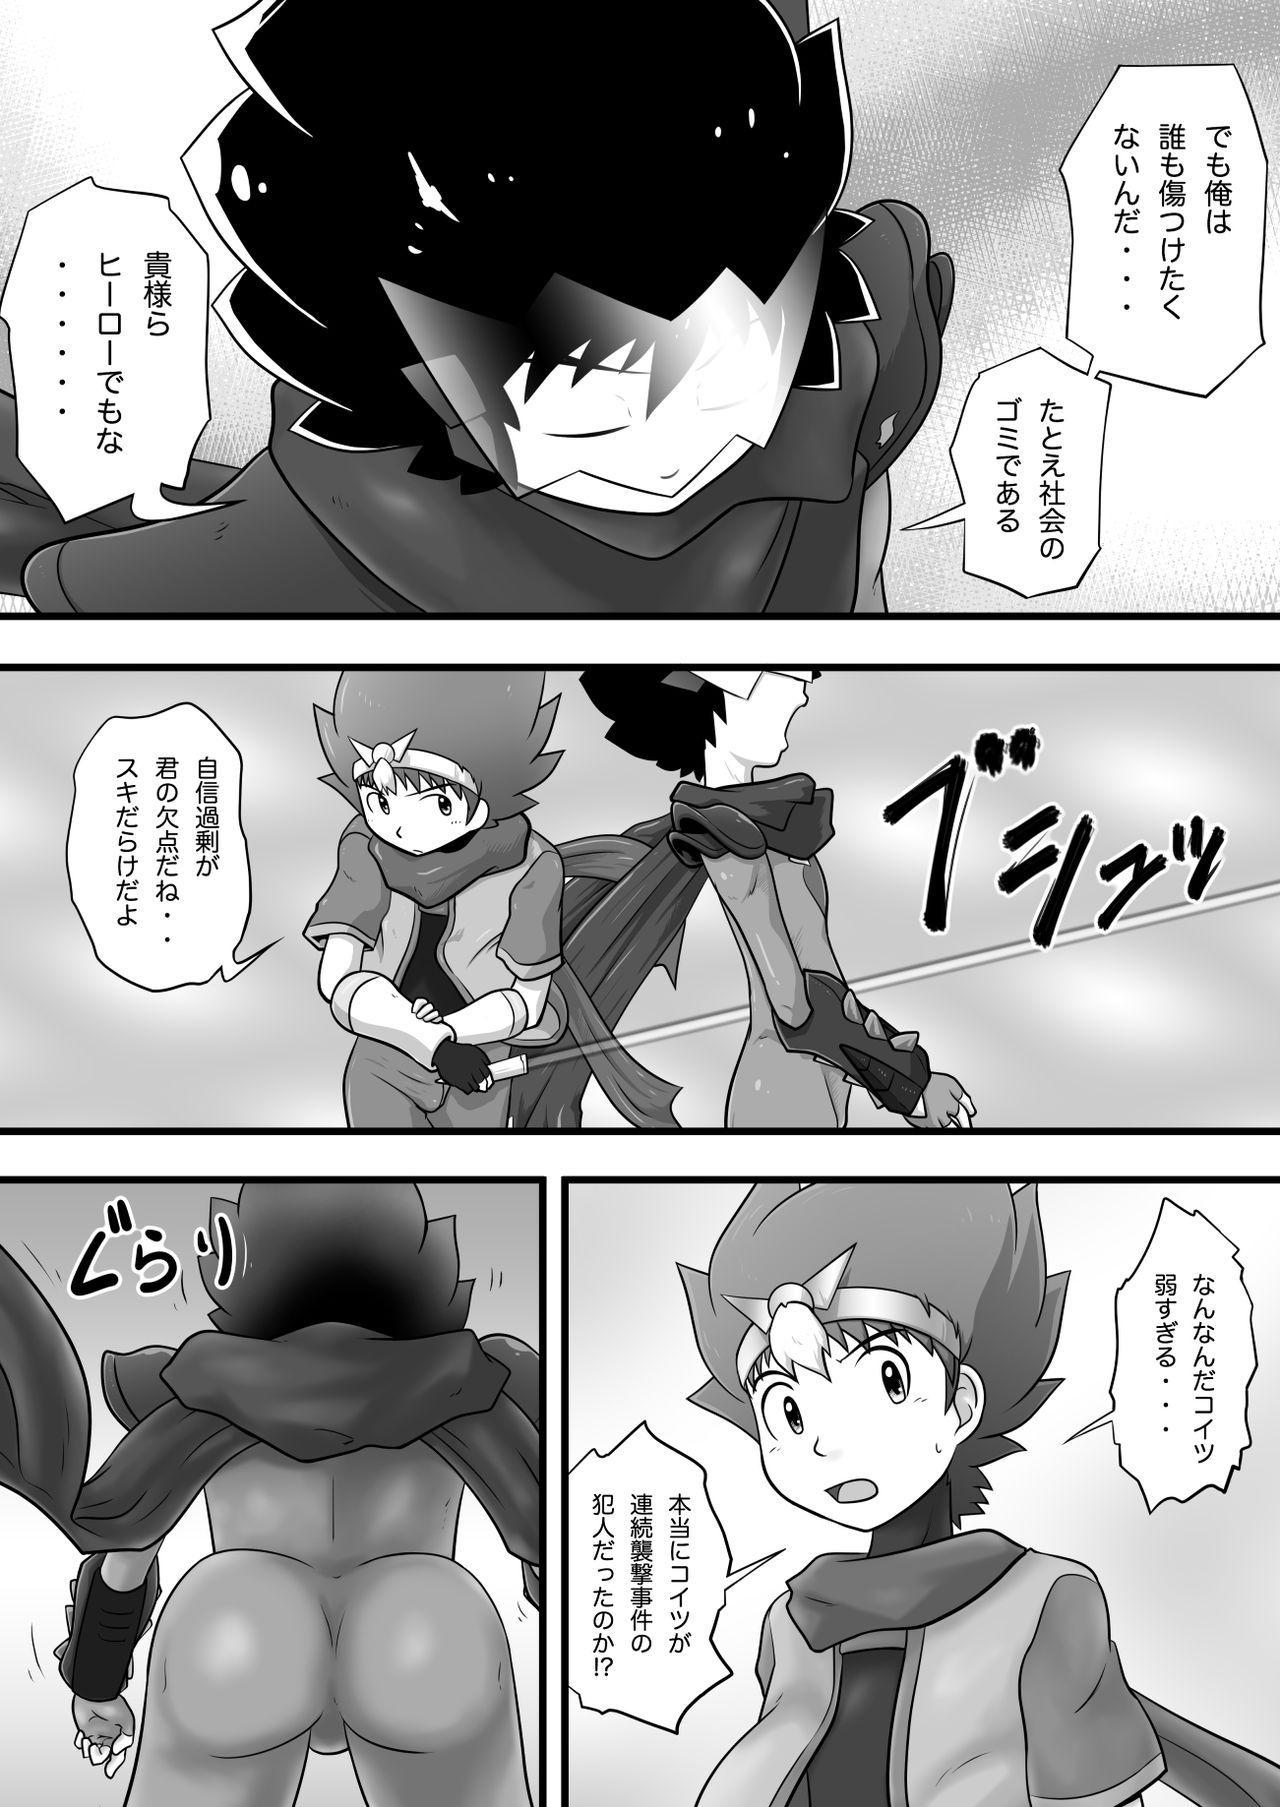 Chrono Kid TSURUGI VS Enboy 8